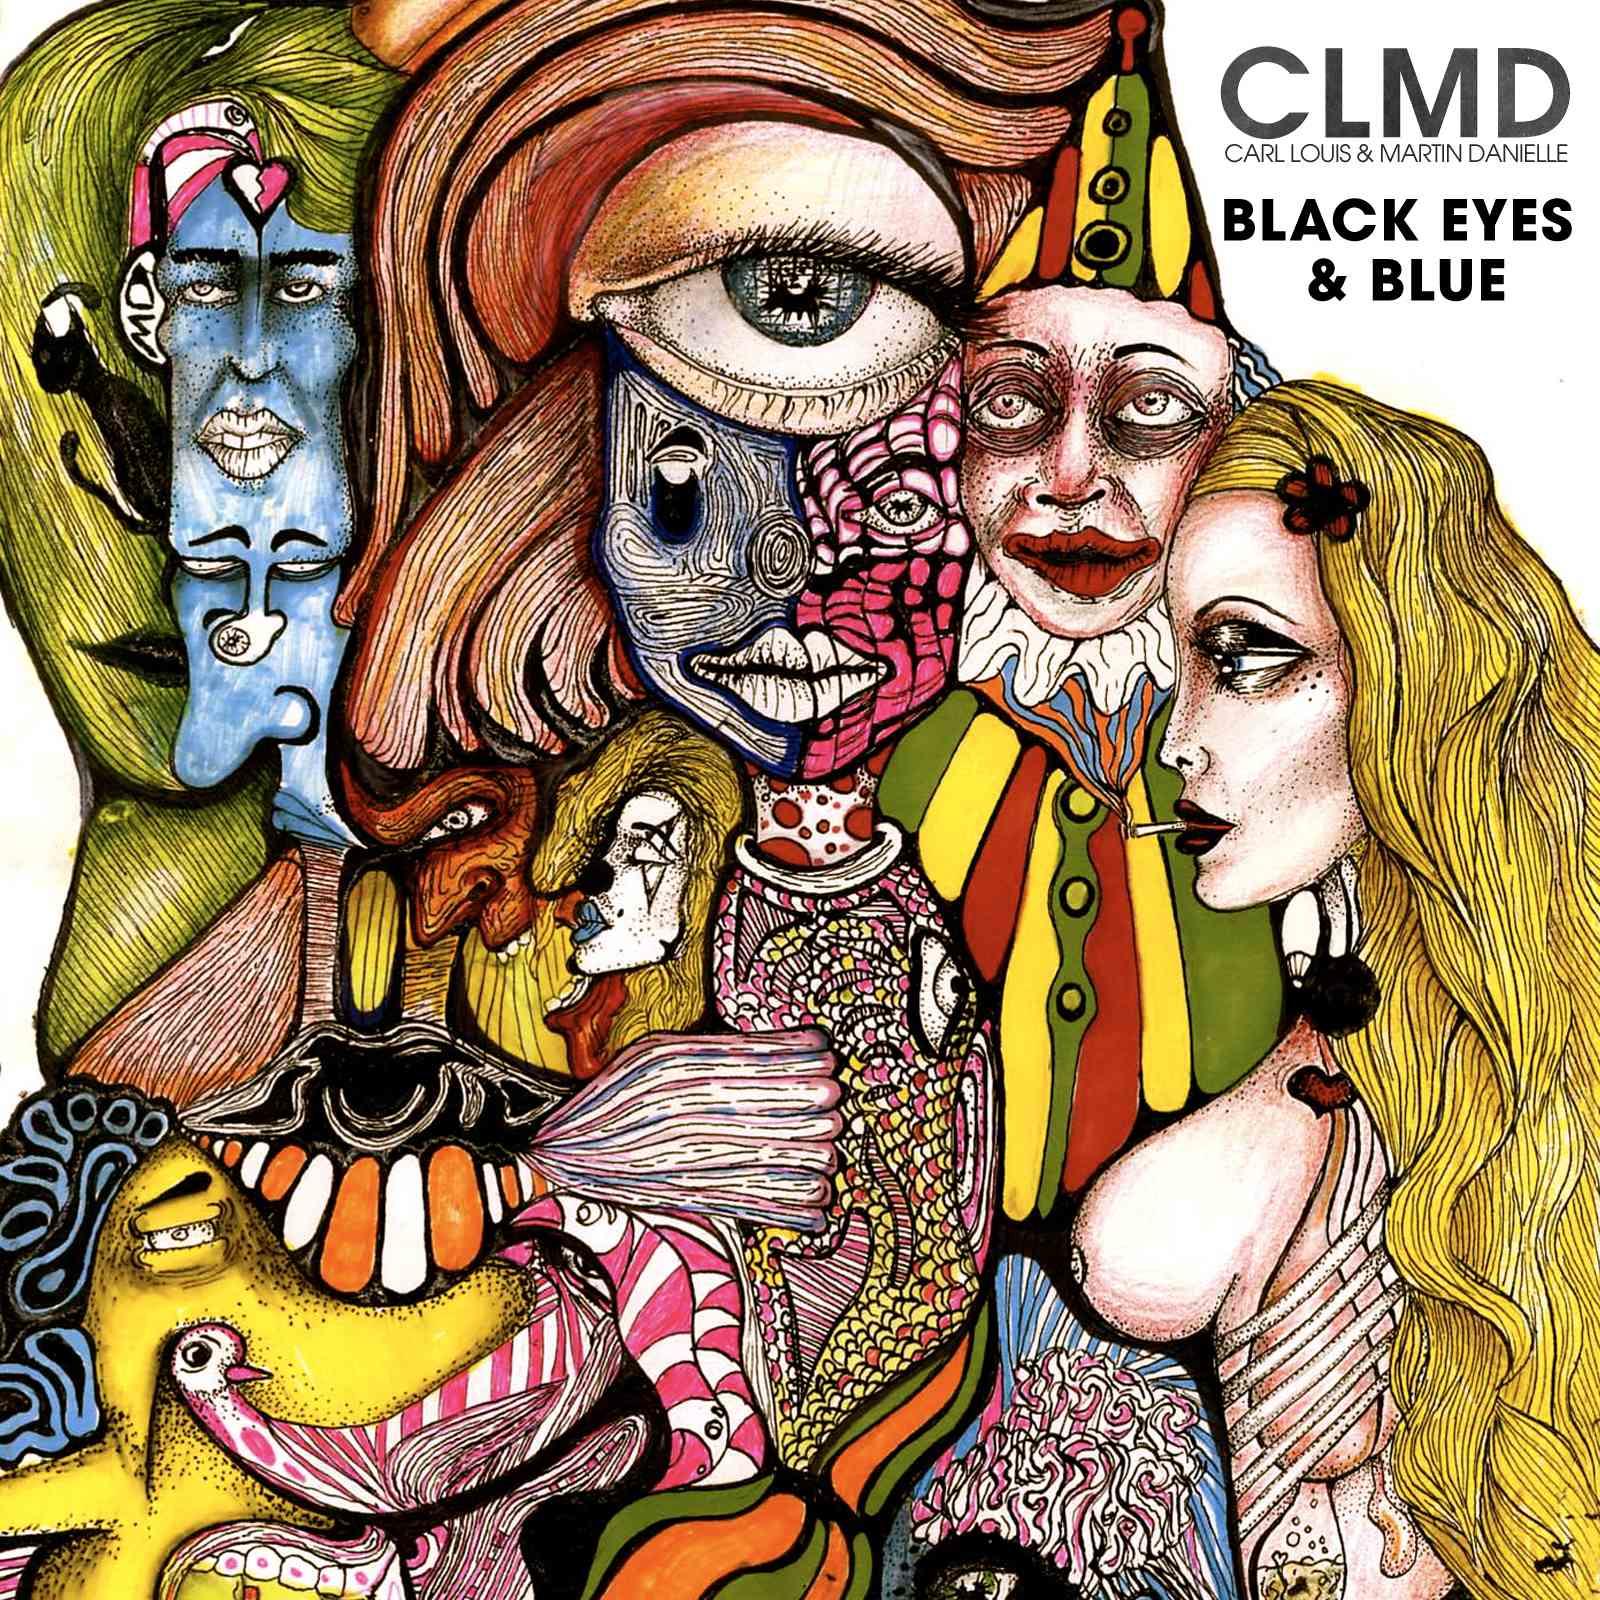 CLMD – Black Eyes & Blue (Original Mix)